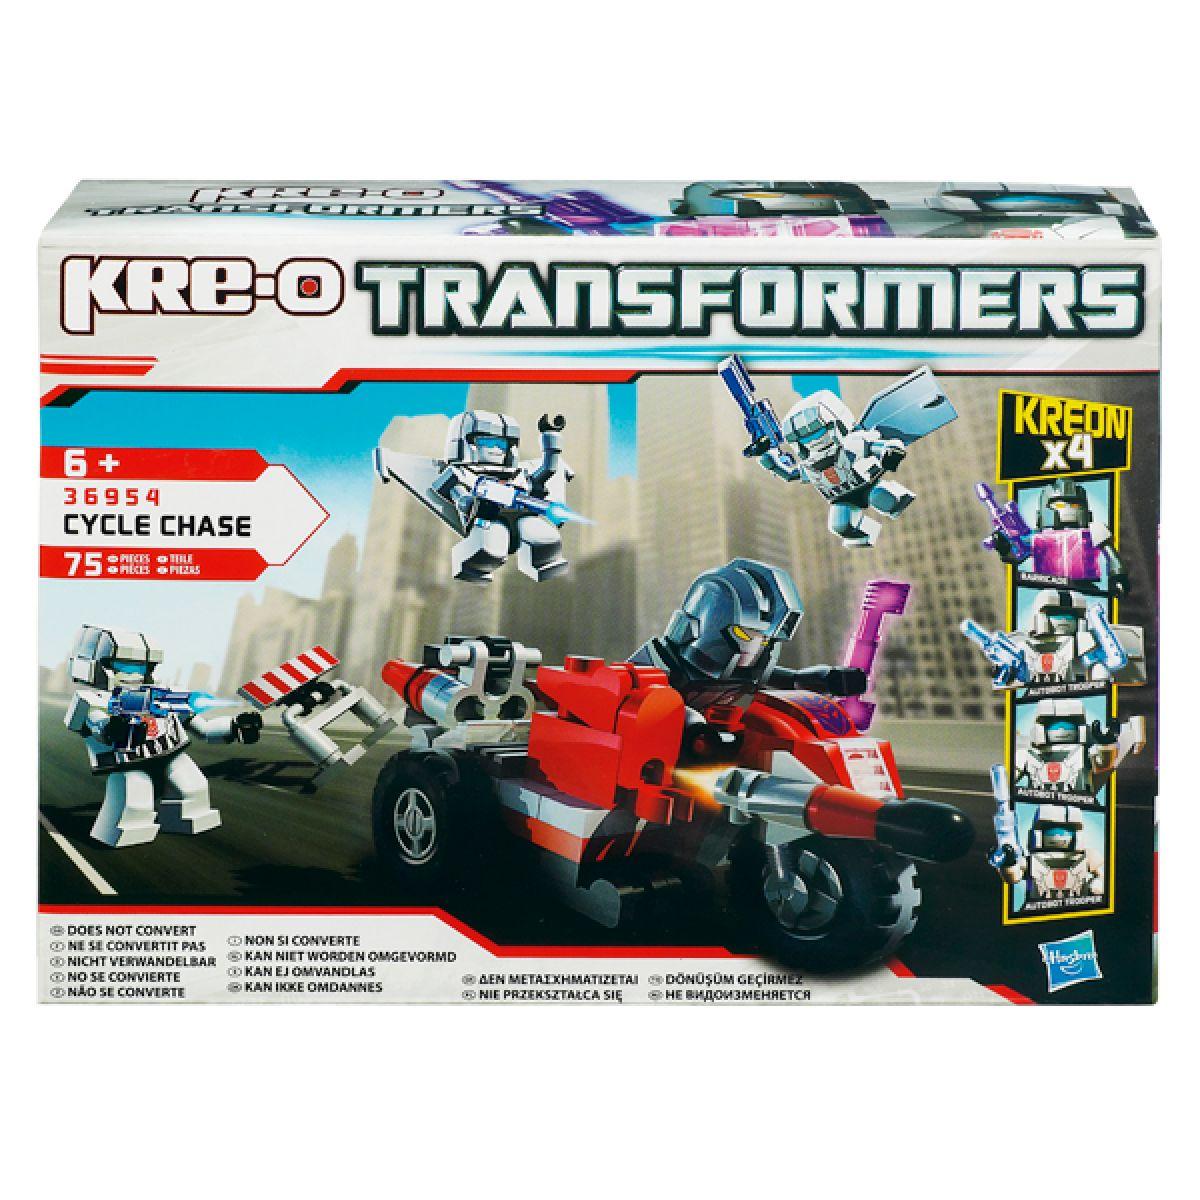 Kre-O Transformers stavebnice s motocyklem a raketami